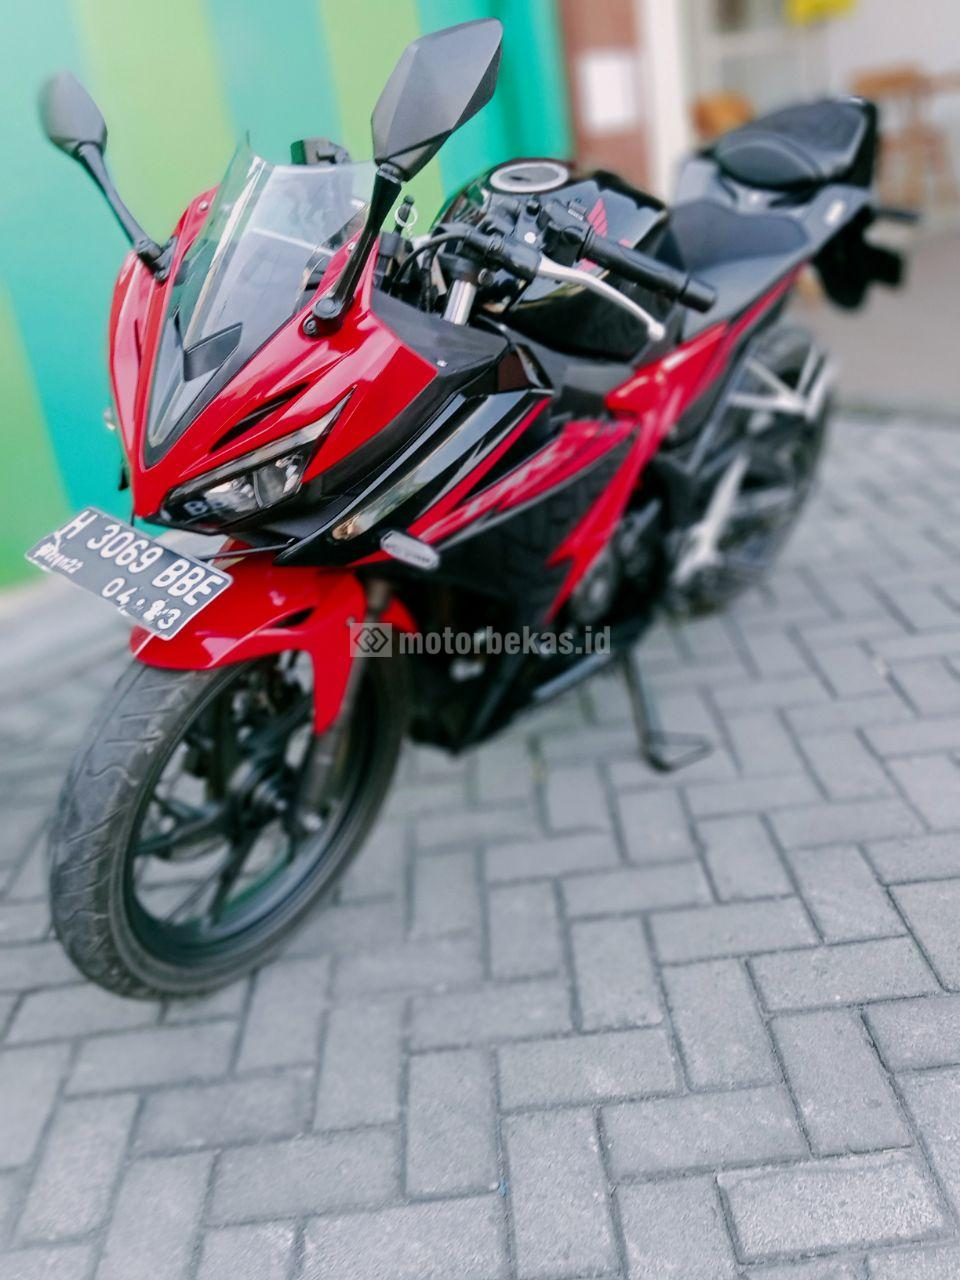 HONDA CBR 150R FI 3186 motorbekas.id